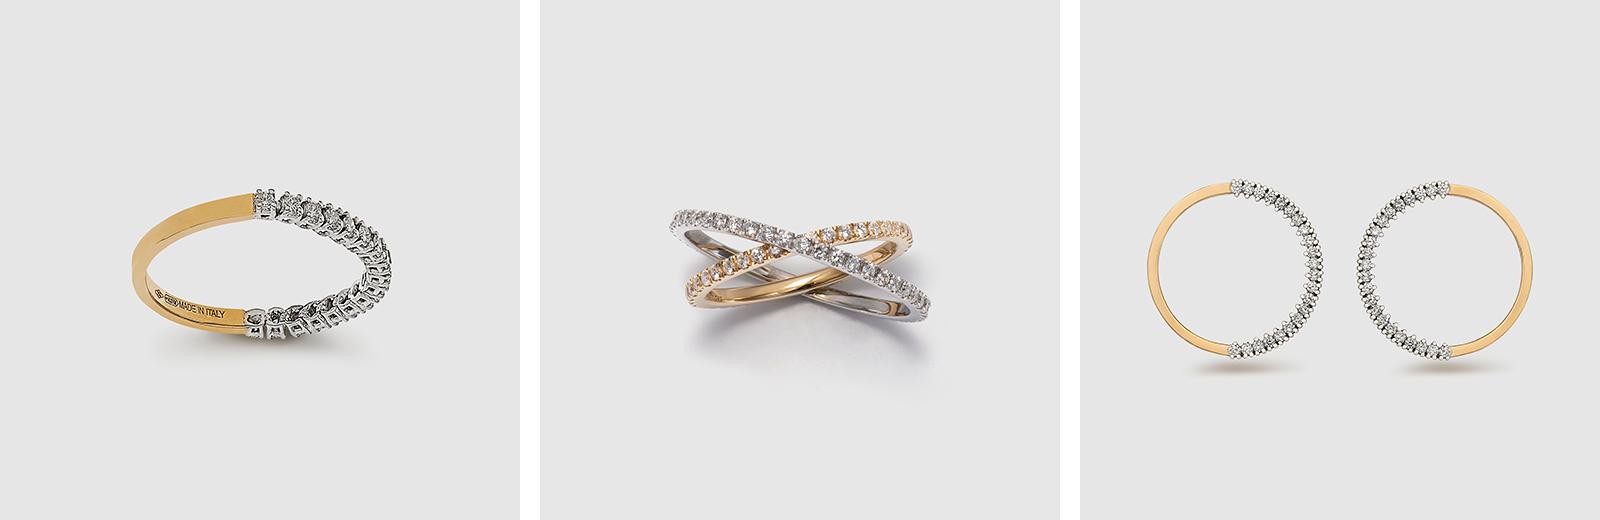 dsmg_jewellery_delifna3.jpg